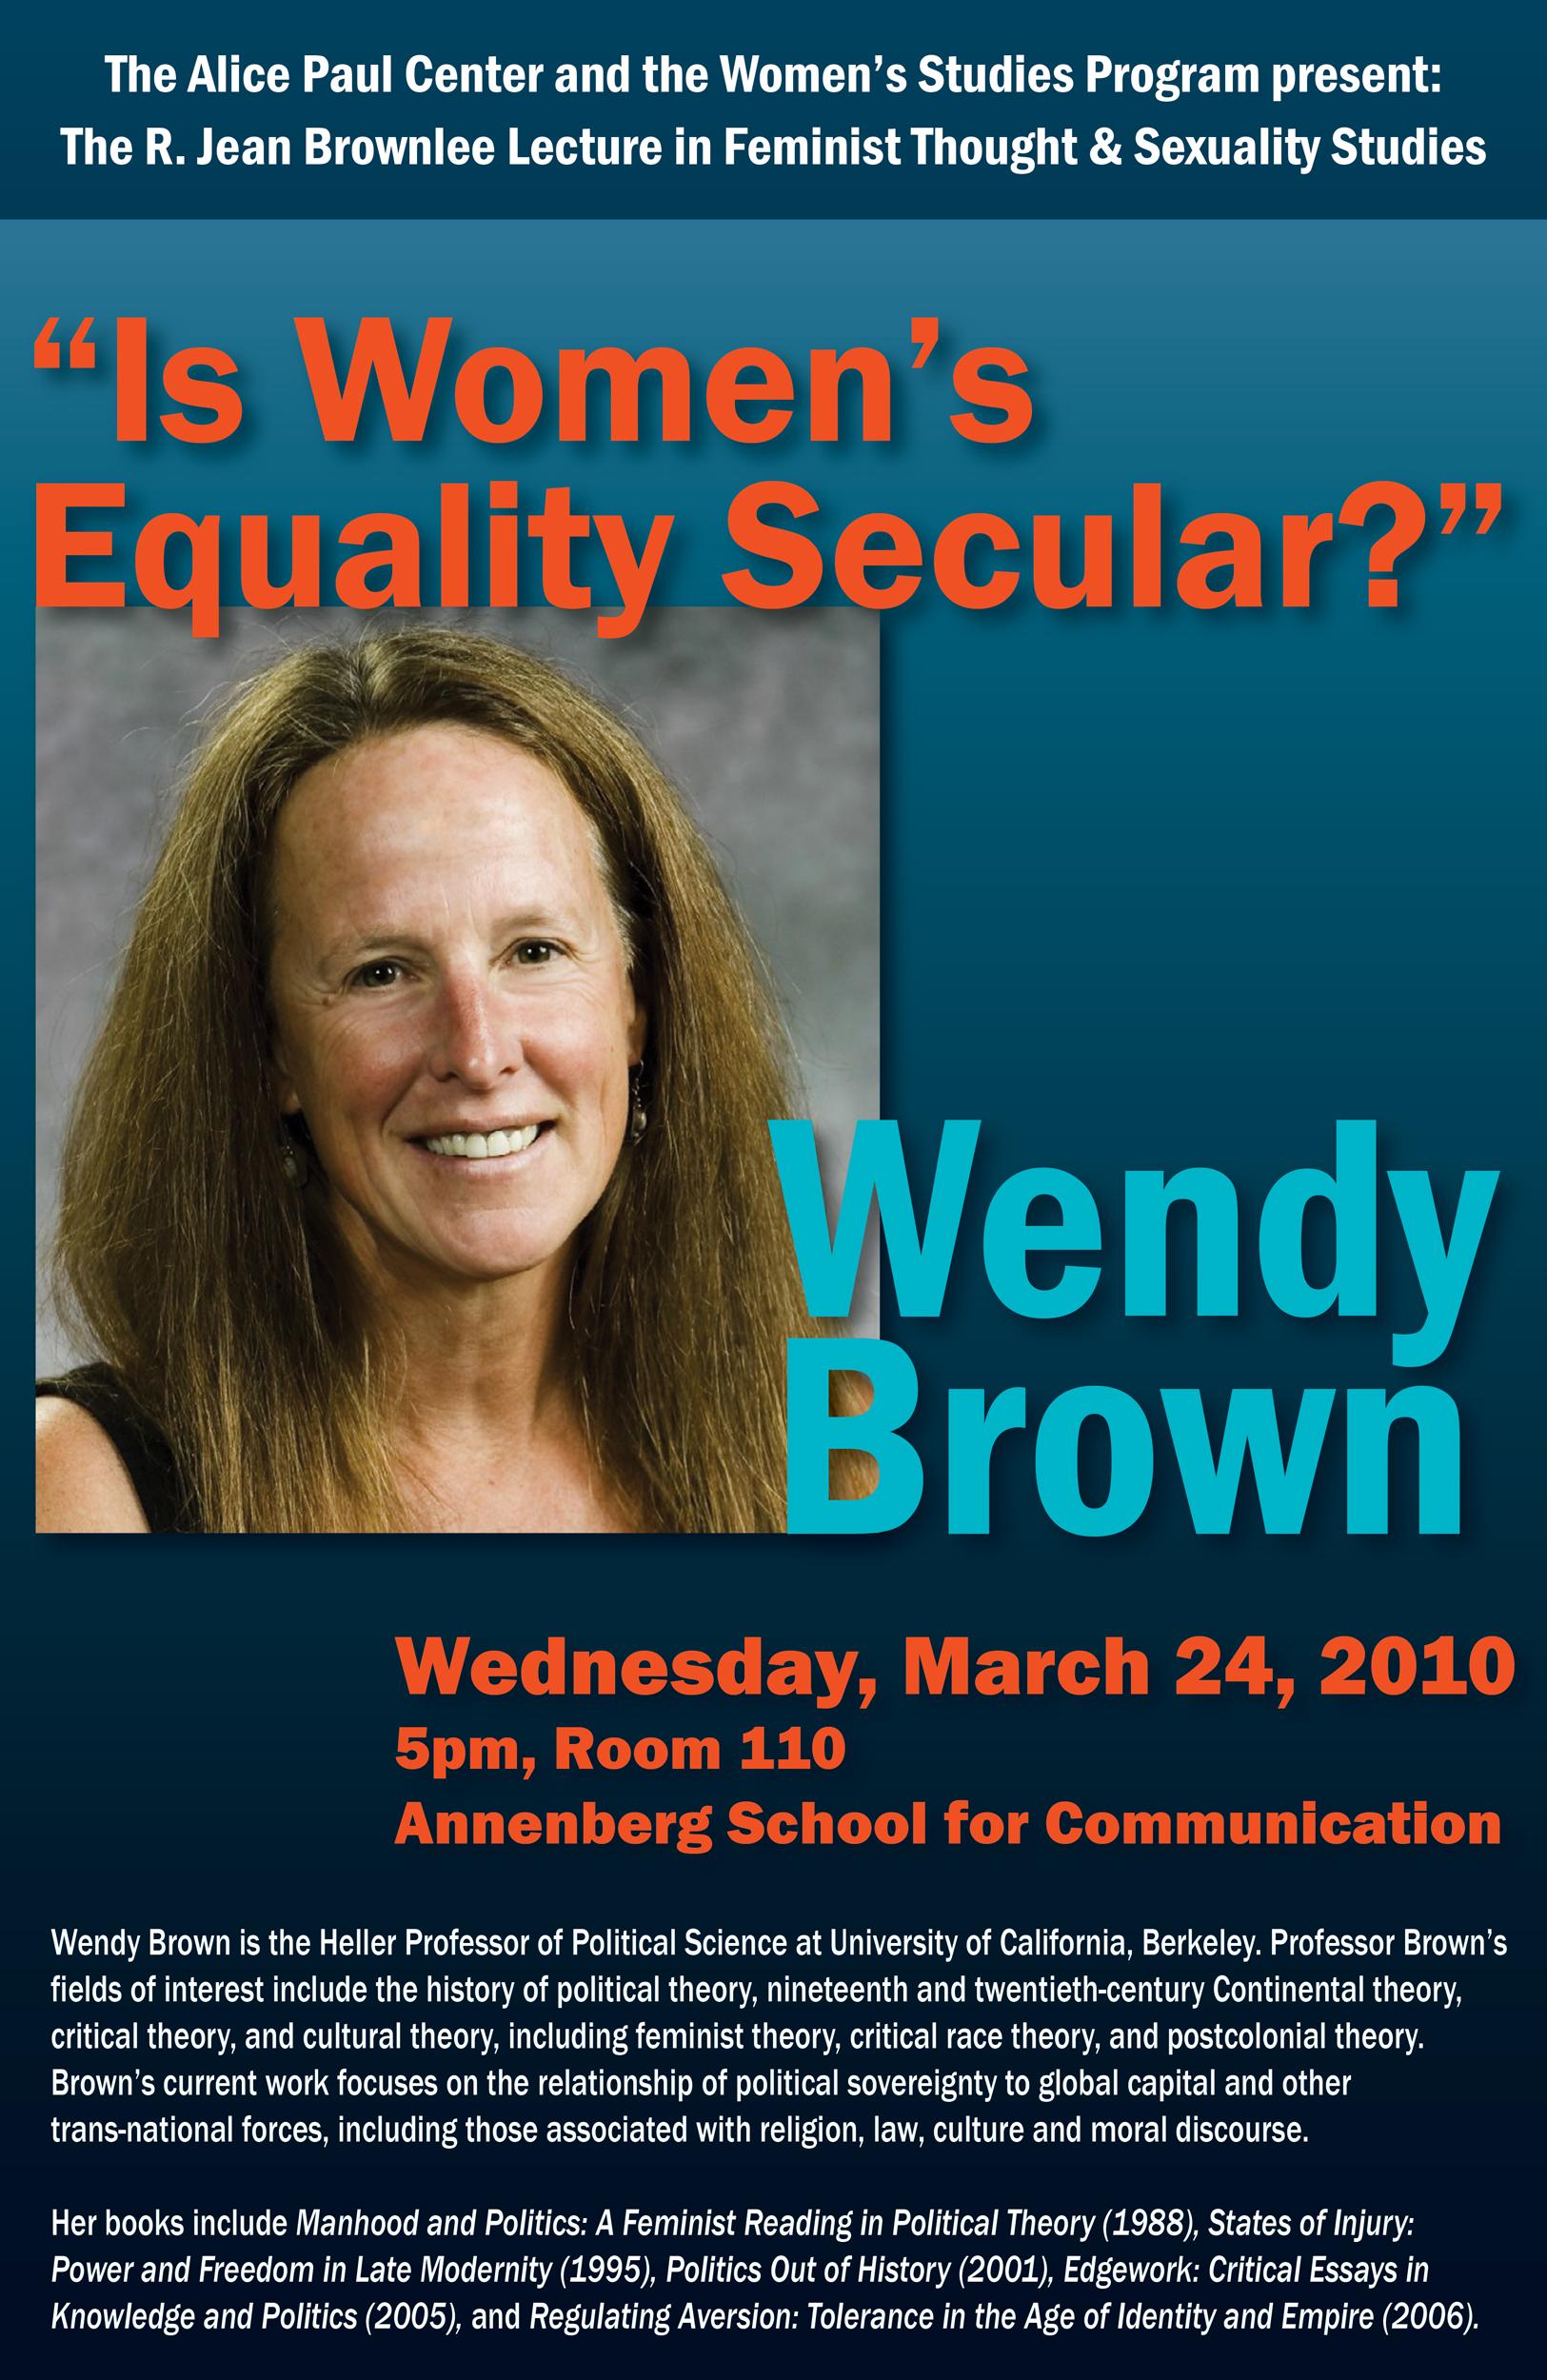 Event poster, University of Pennsylvania Women's Studies Program